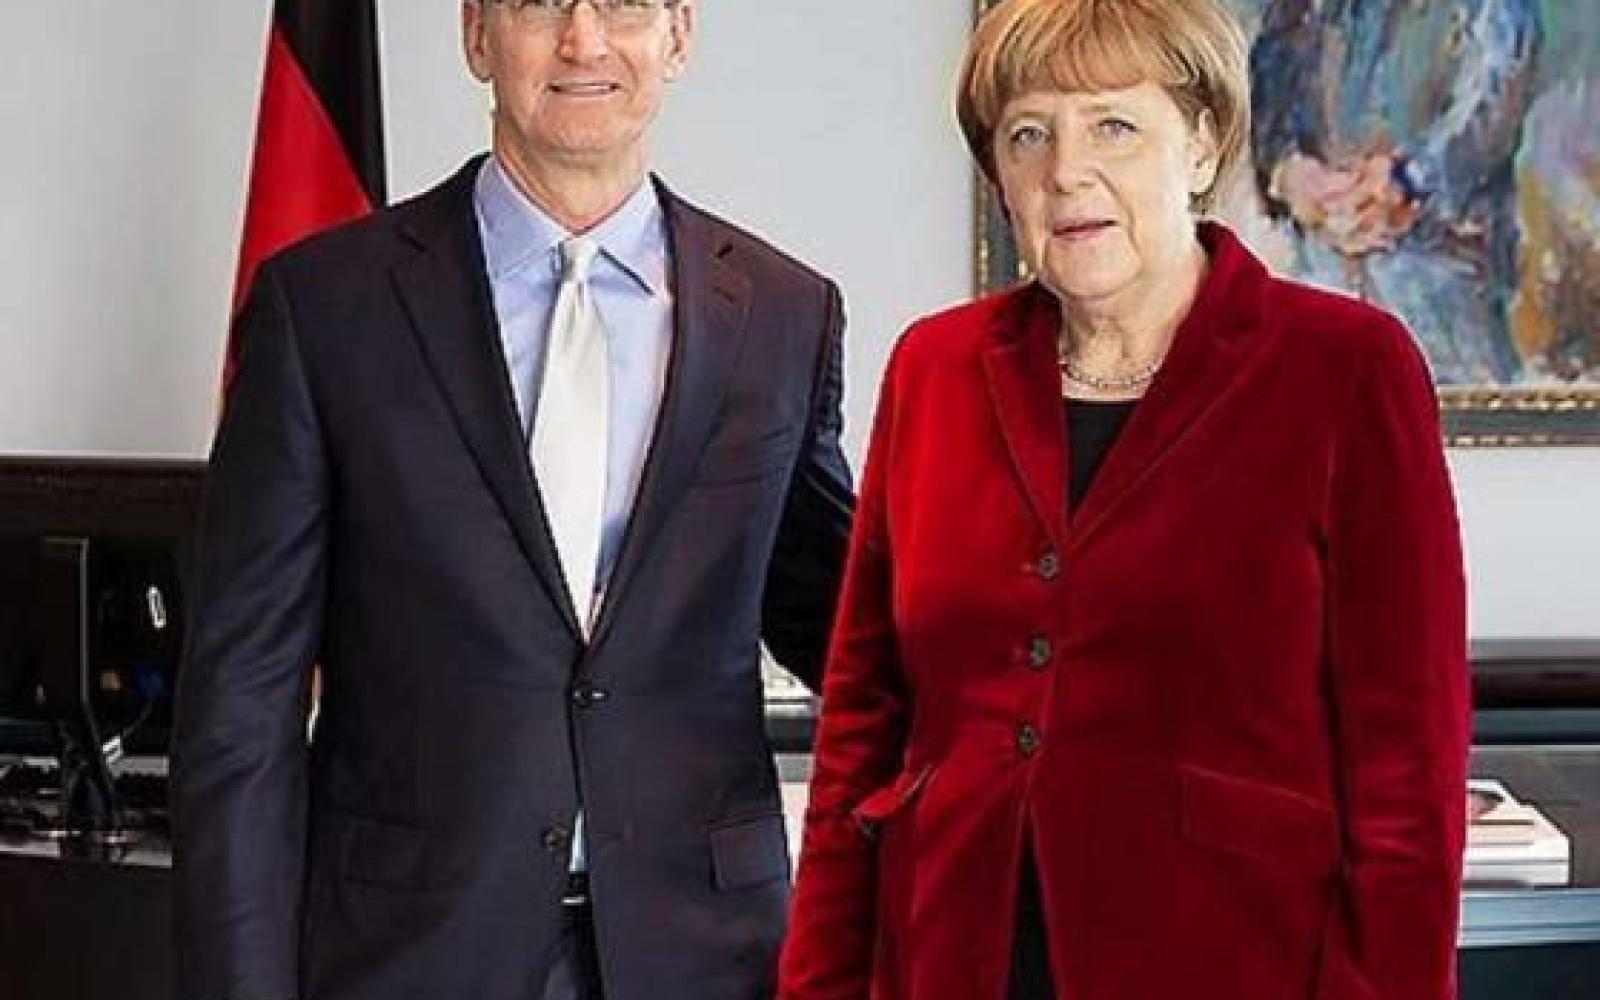 Tim Cook met with German Chancellor Angela Merkel during Berlin visit, talked privacy, security & more